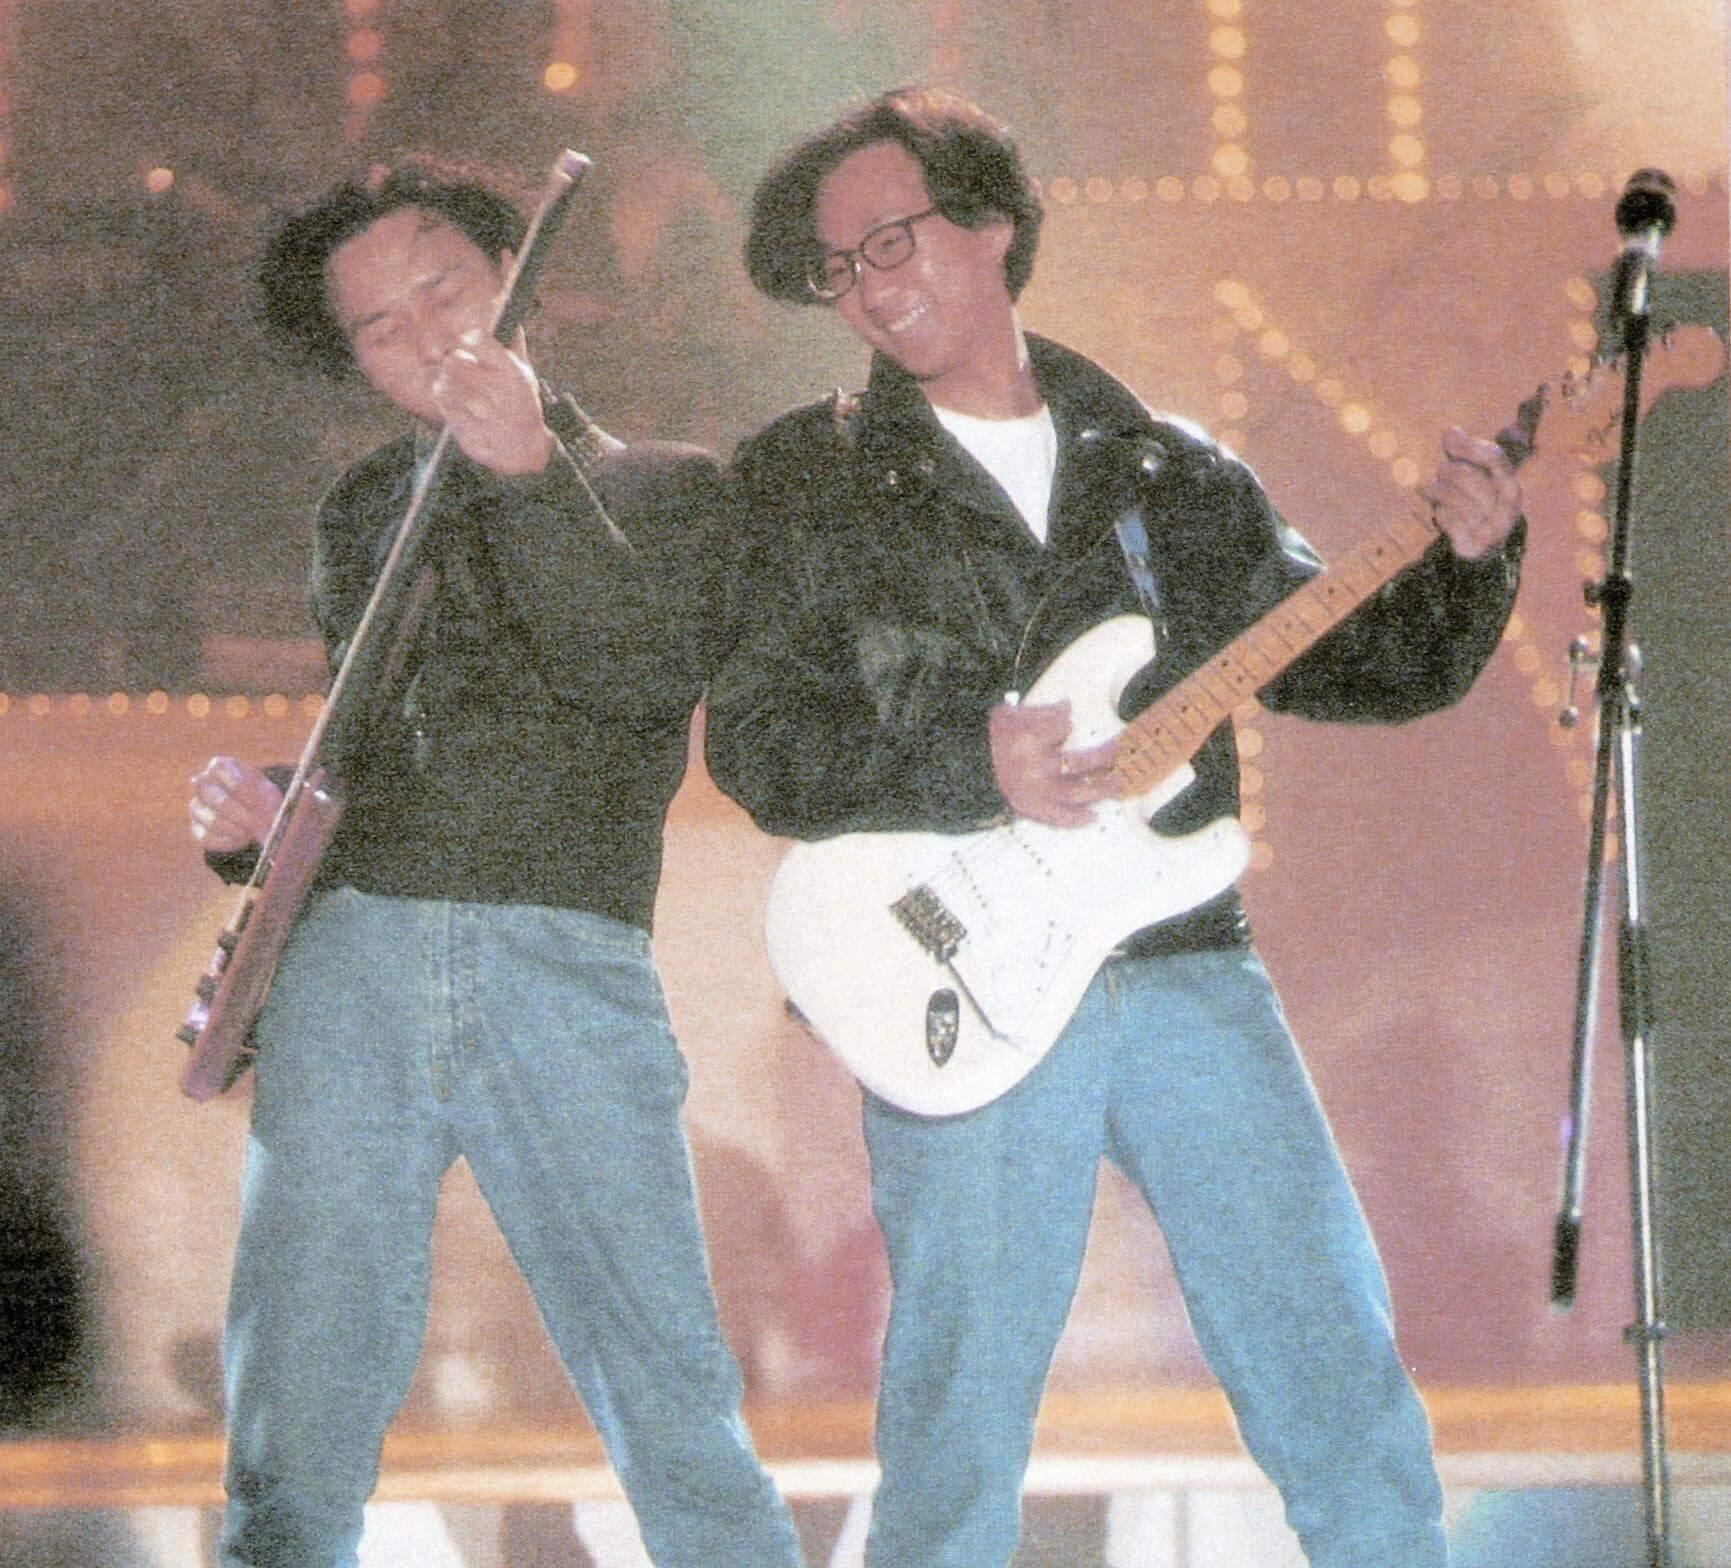 Beyond大受年輕人歡迎,九○年,踏上了十大金曲頒獎禮的舞台。